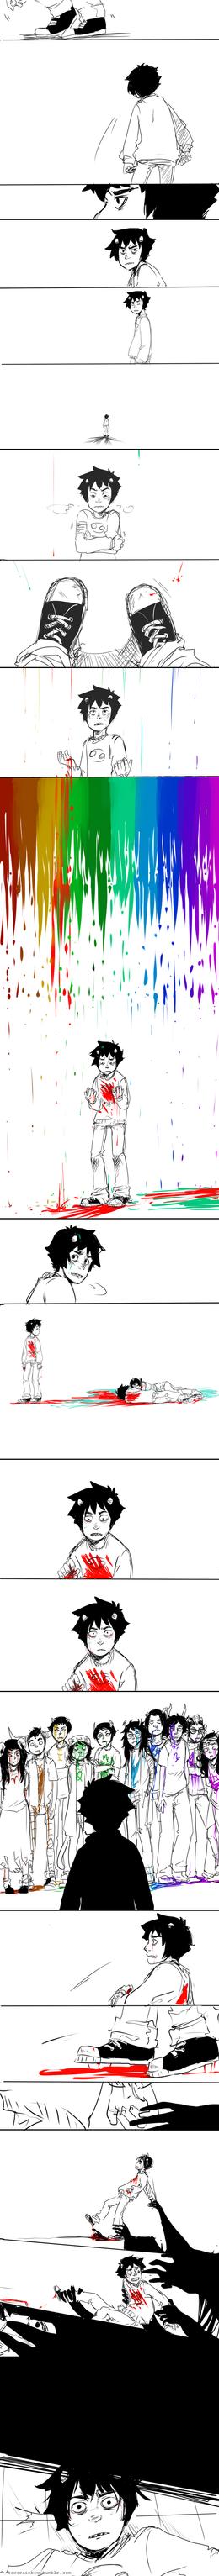 past karkat: wake up by ryounkura